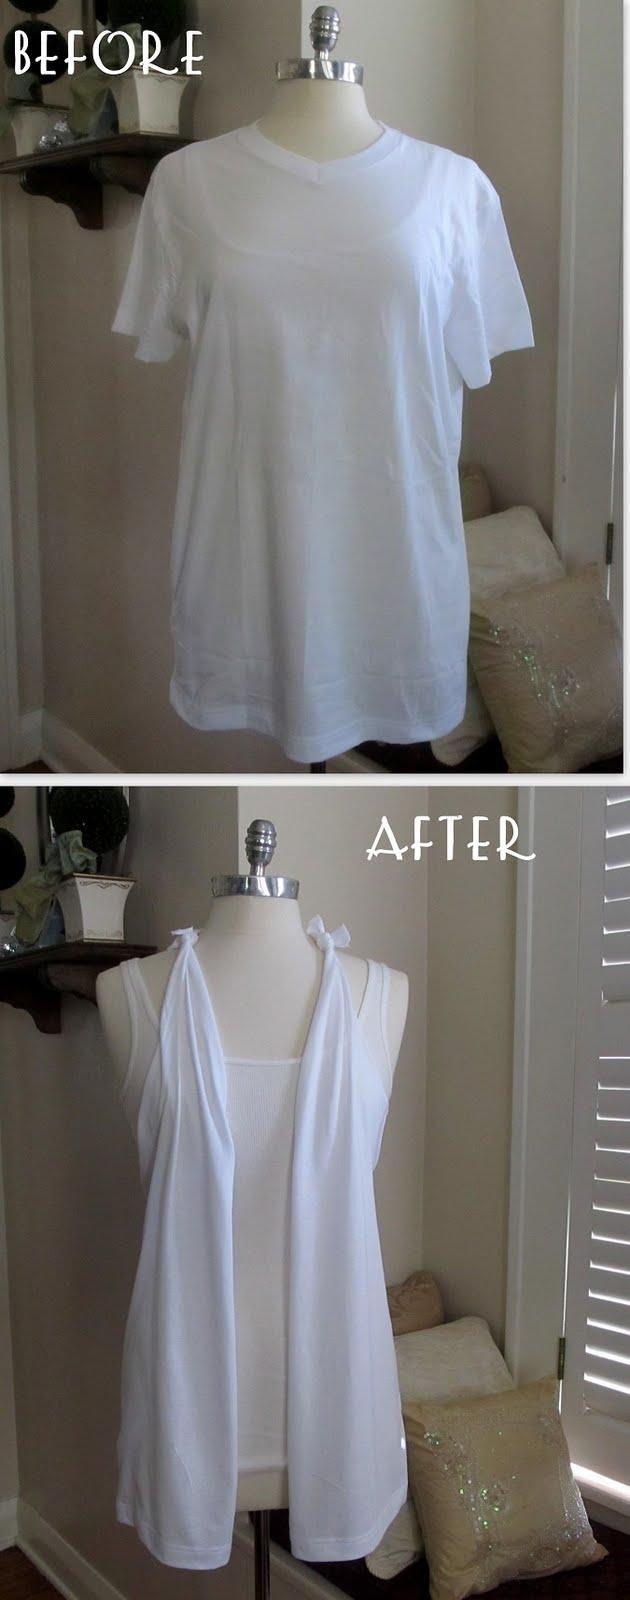 DIY Clothes Refashion: DIY No Sew, T-Shirt Vest. A great beachwear coverup!